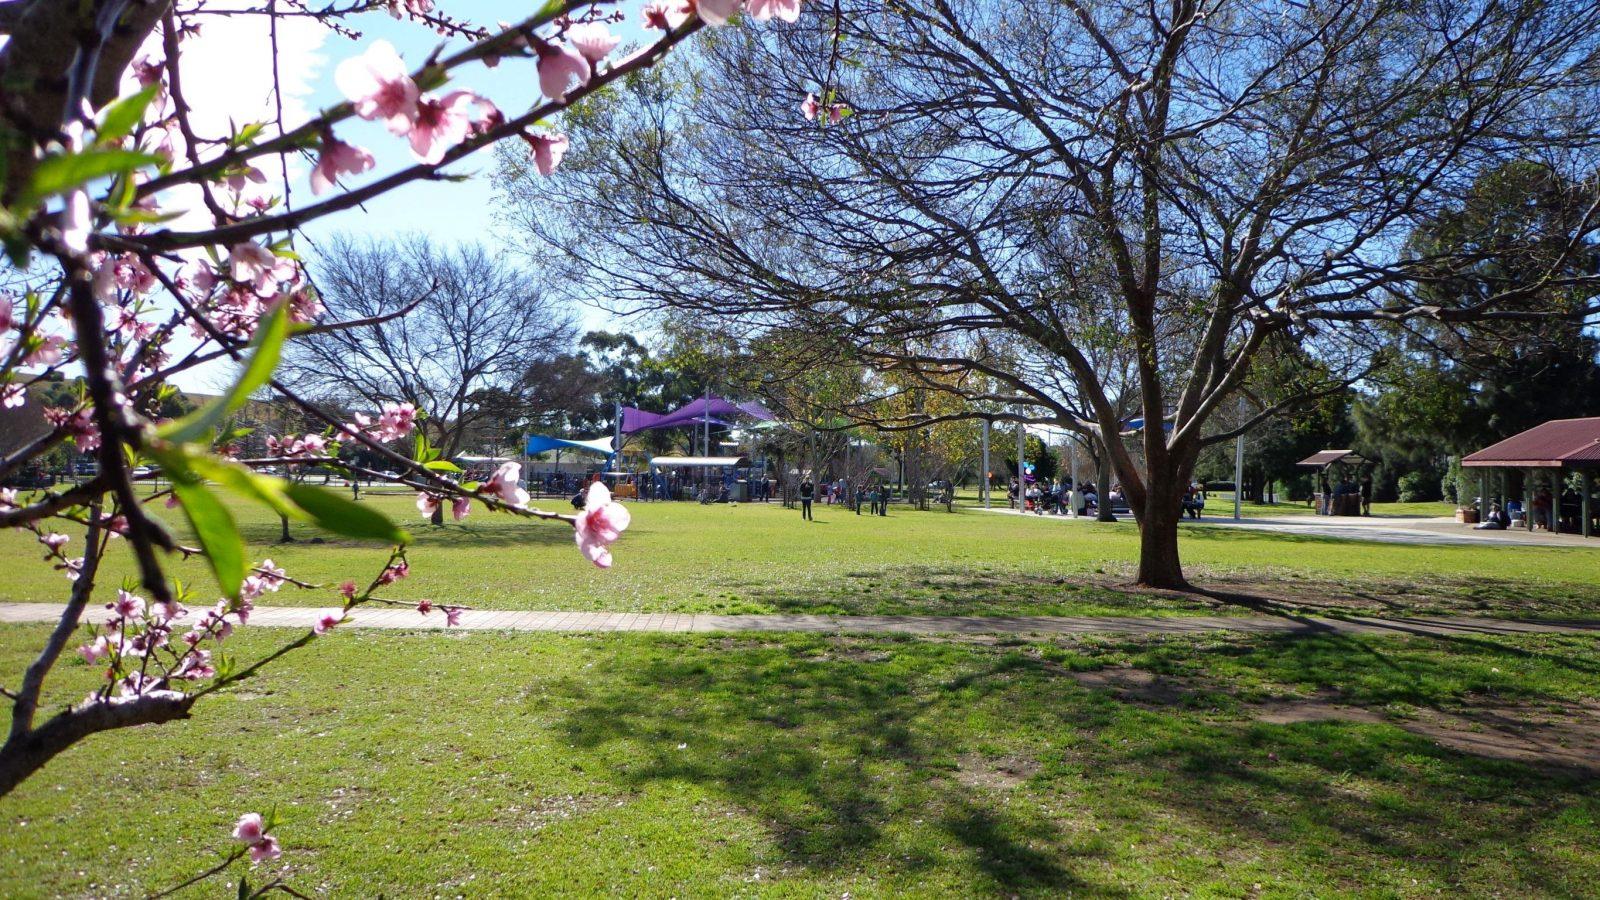 Koshigaya Park Campbelltown NSW